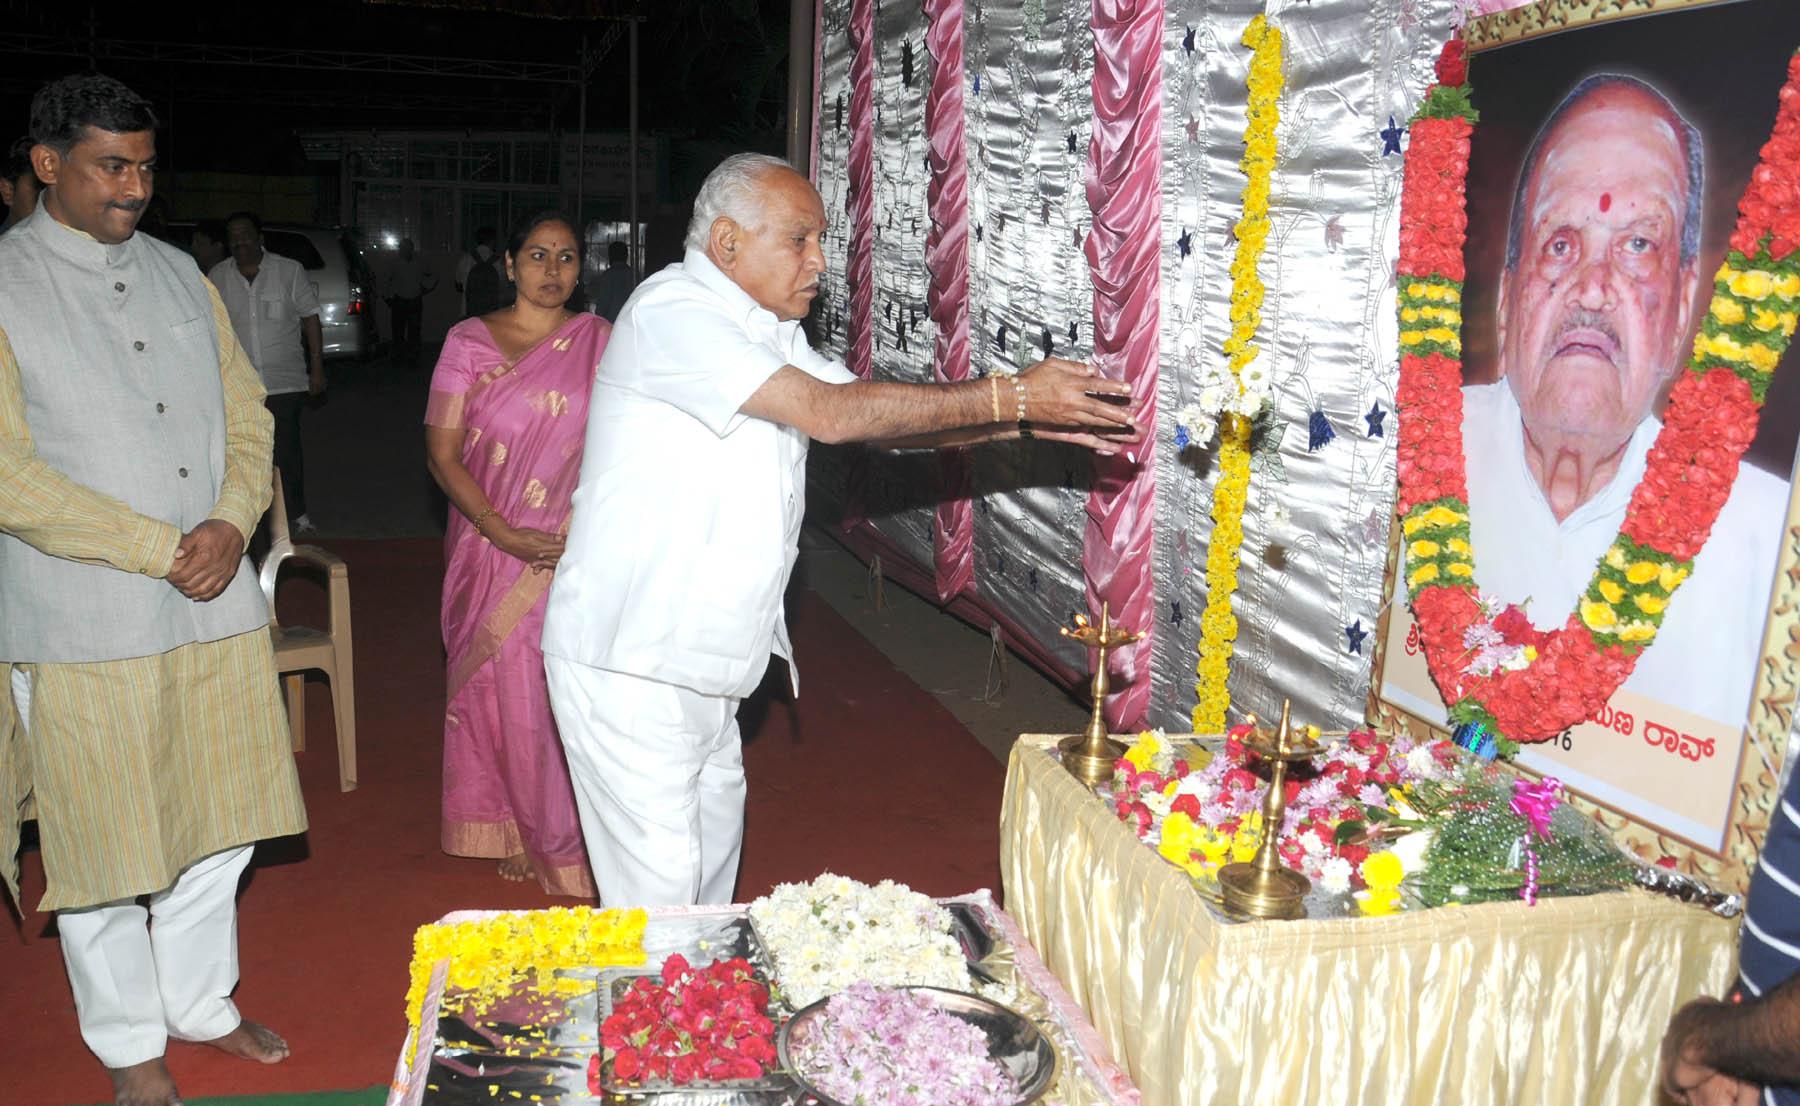 k-suryanarayan-rao-shraddhanjali-nov-26-2016-1